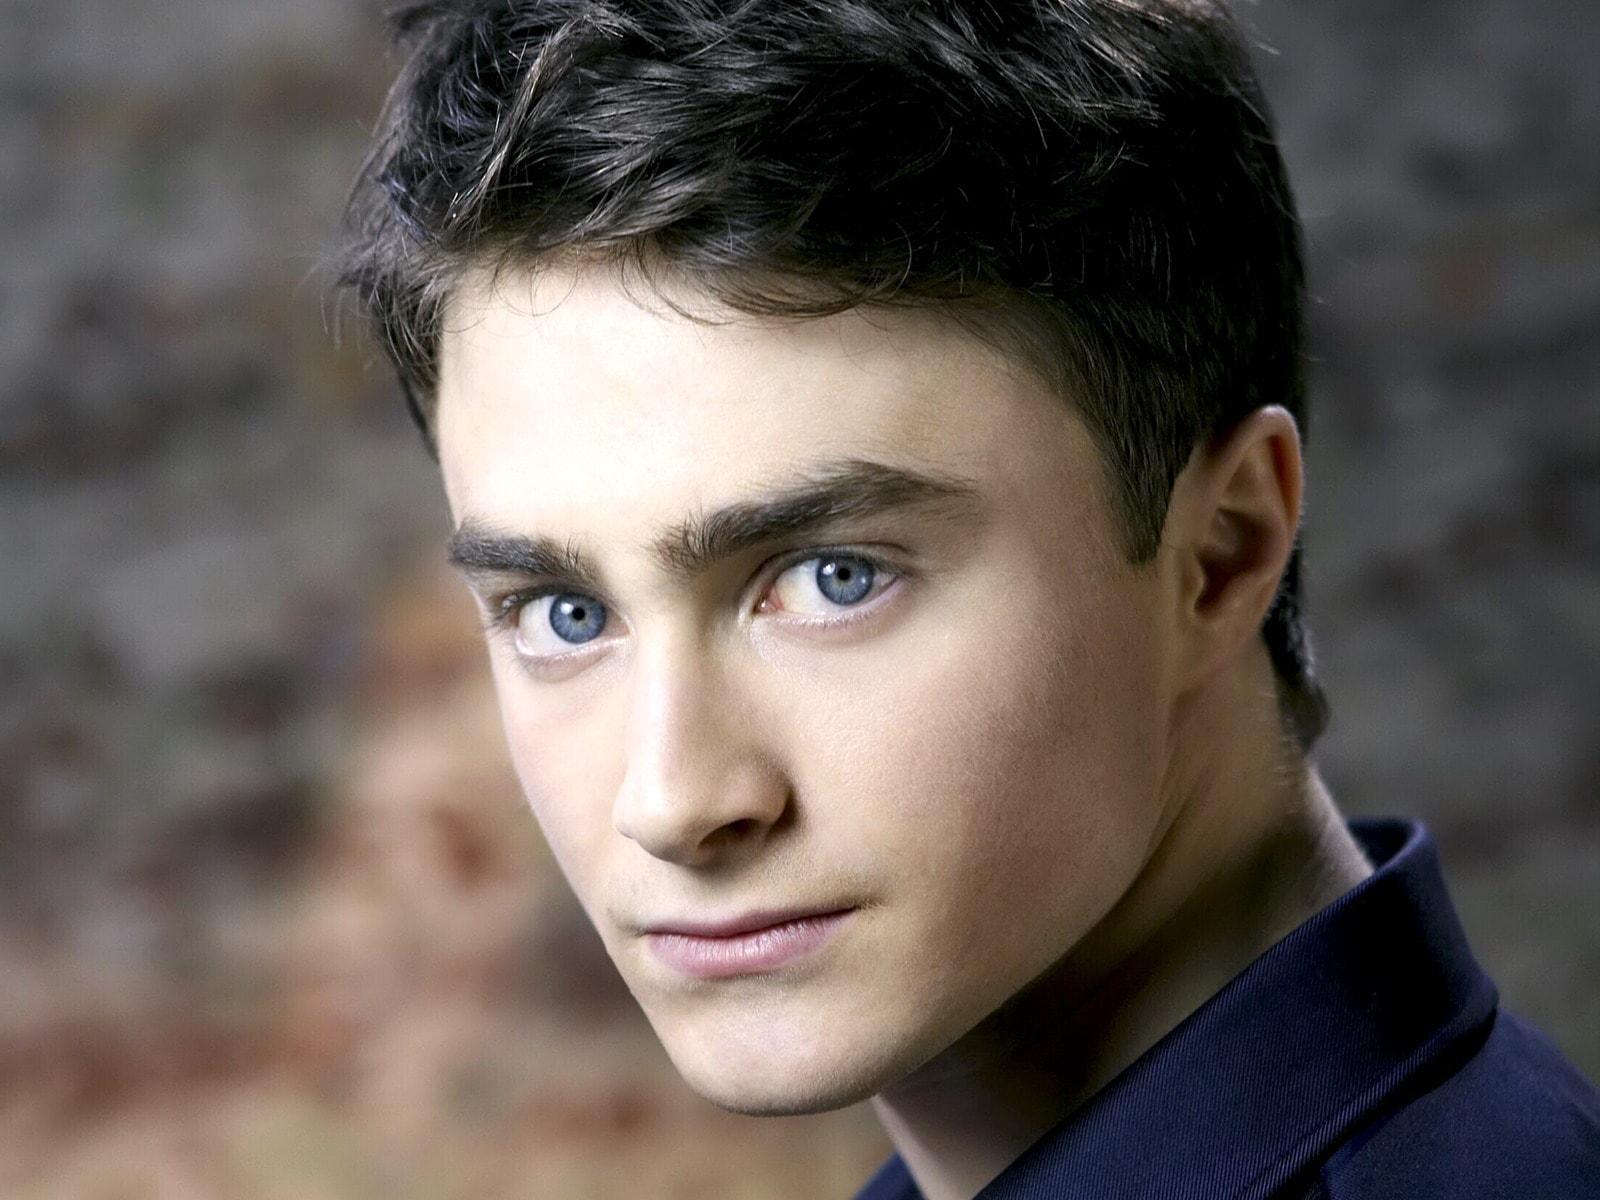 Daniel Radcliffe Full hd wallpapers